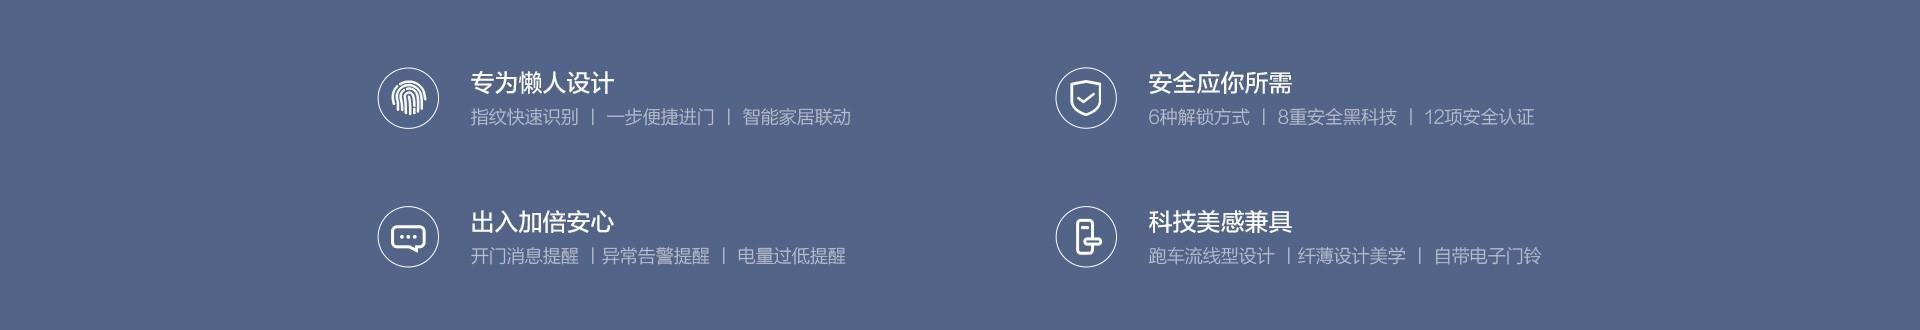 DL20S-WEB_02.jpg